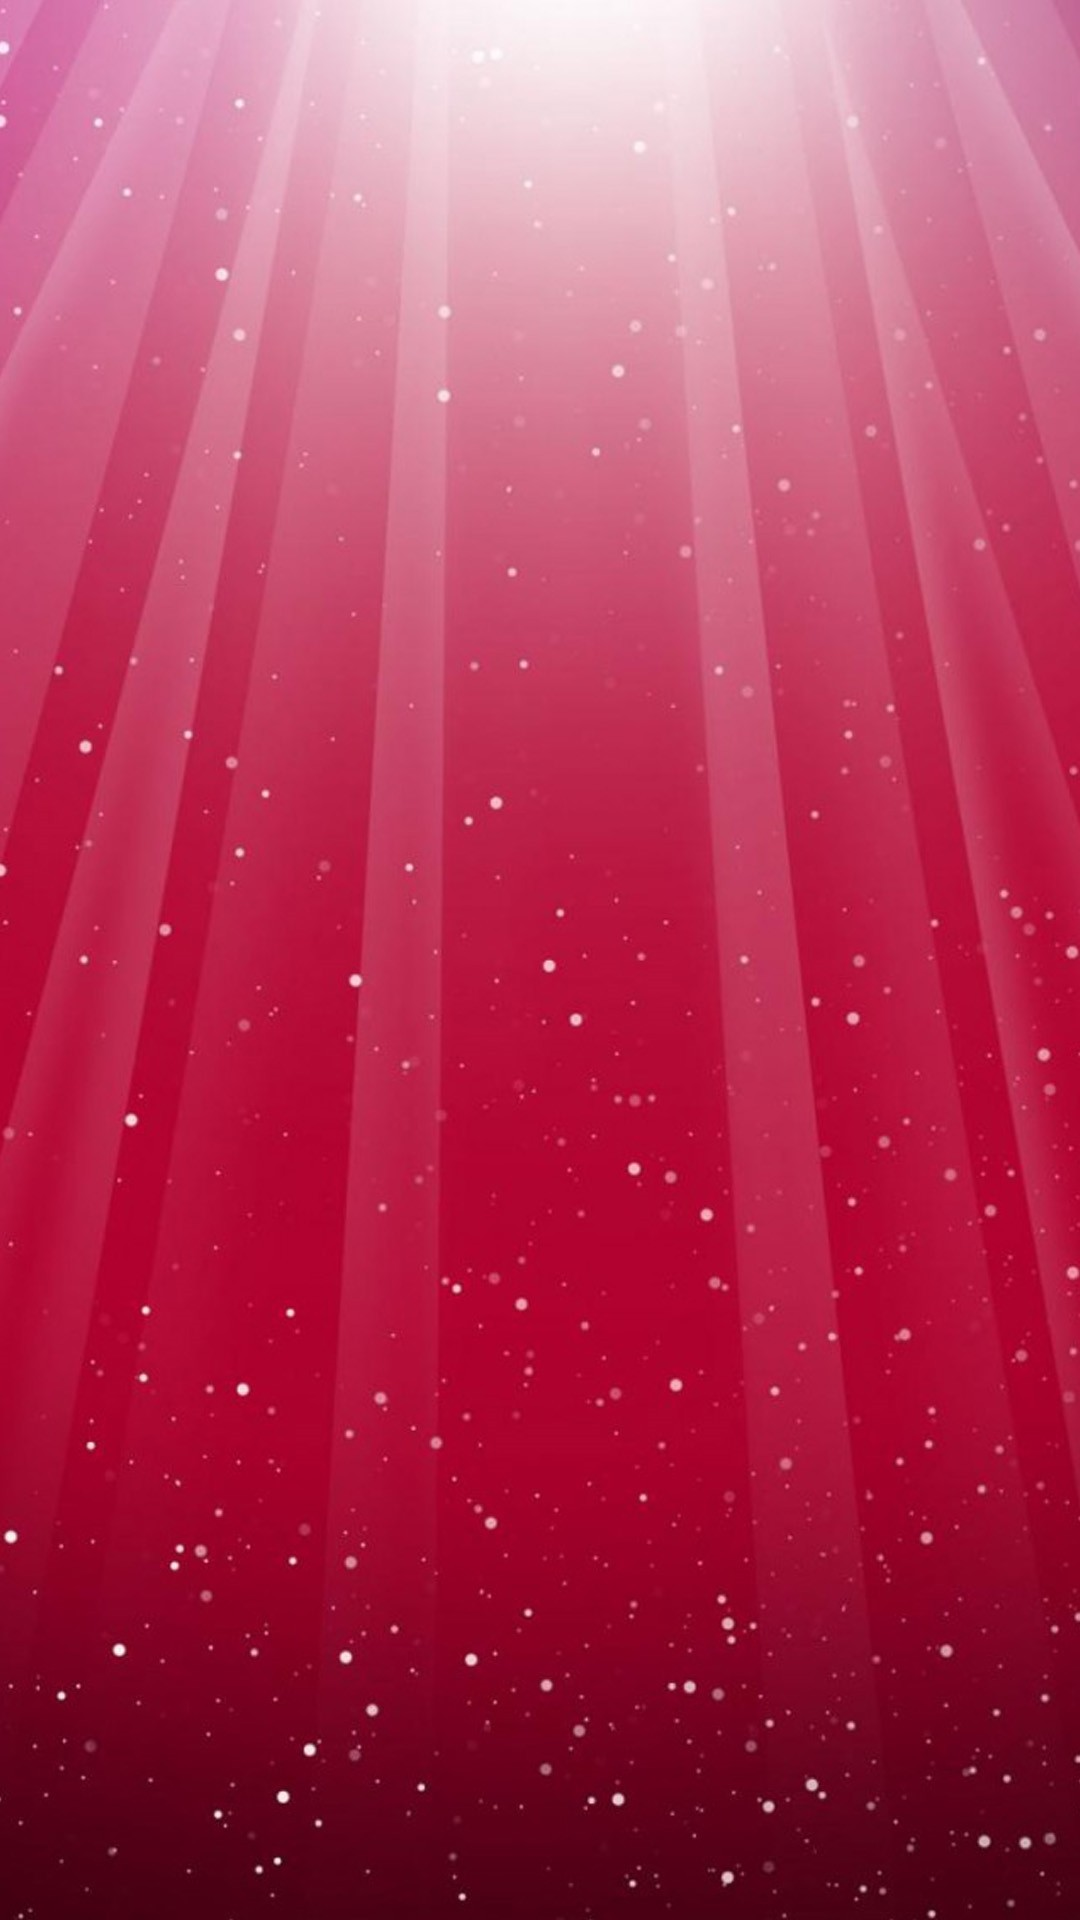 Light Pink screensaver wallpaper